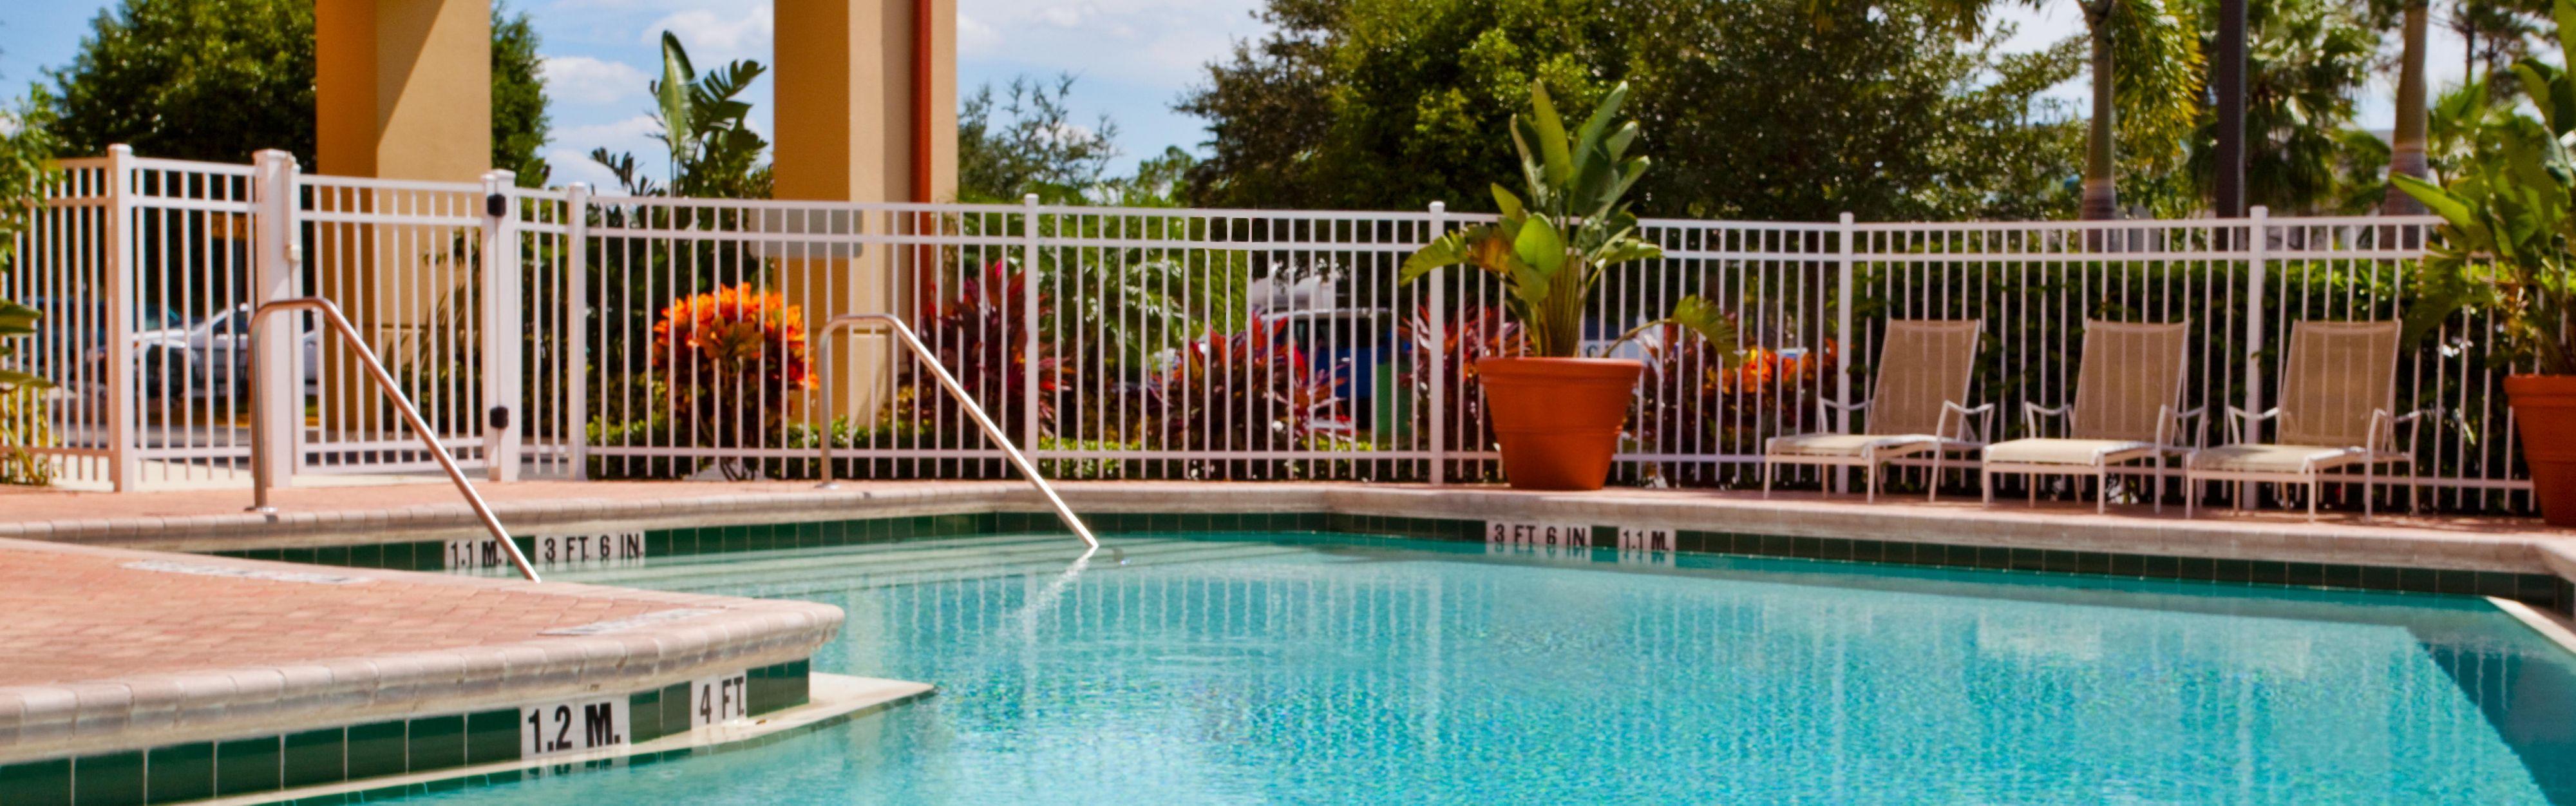 Holiday Inn Express & Suites Nearest Universal Orlando image 2